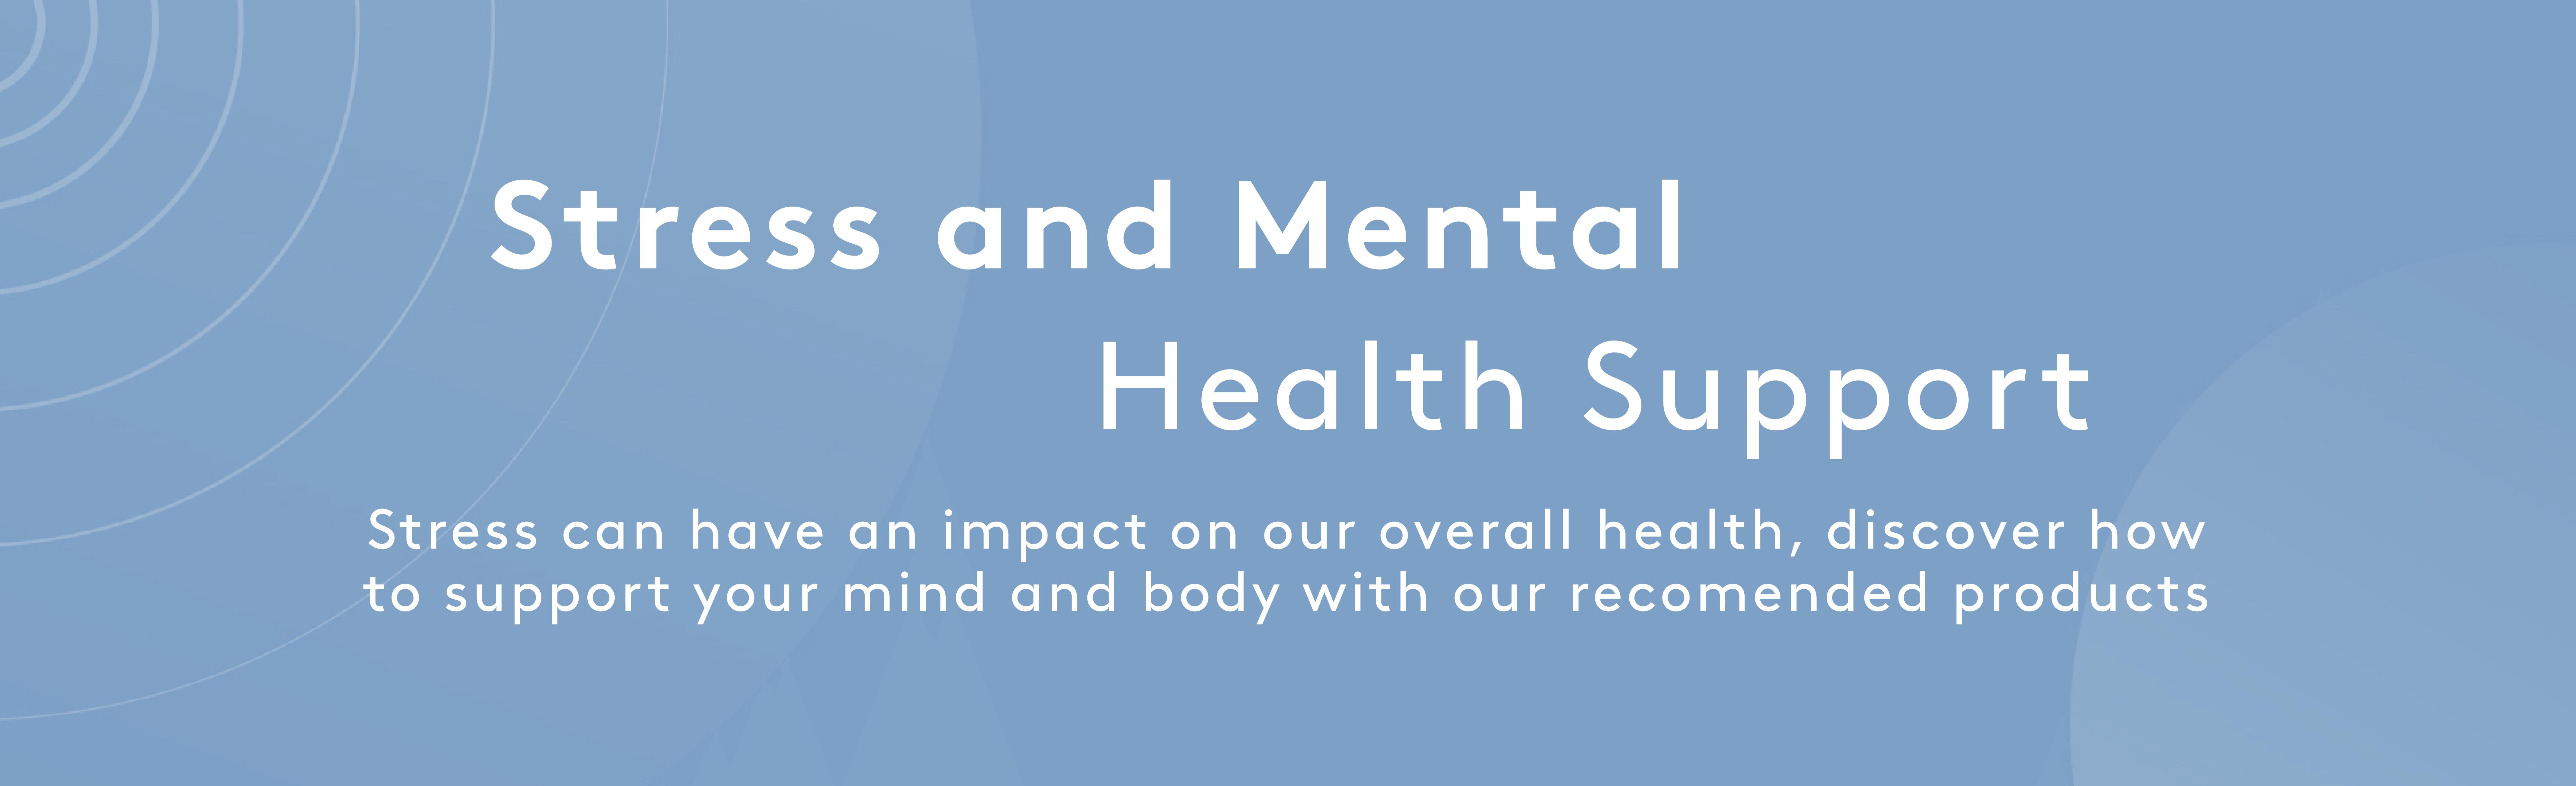 Stress & Mental Health   Myvitamins